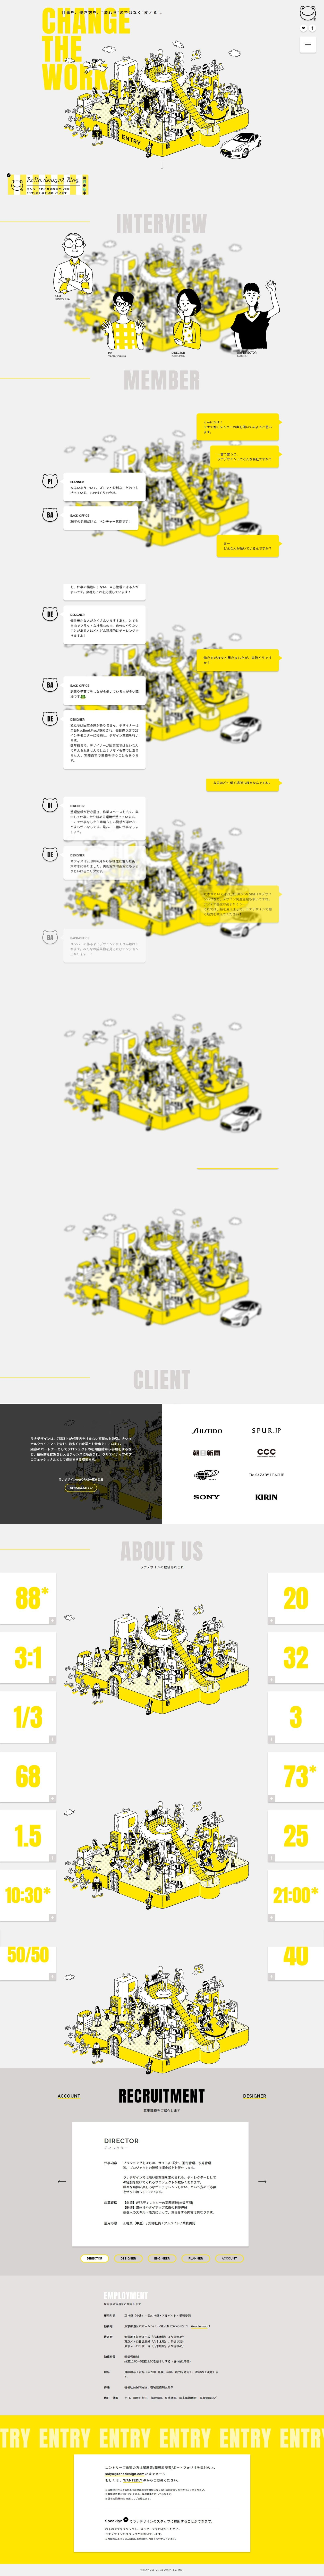 Change the Work|RaNa design associates, inc.(株式会社ラナデザインアソシエイツ)